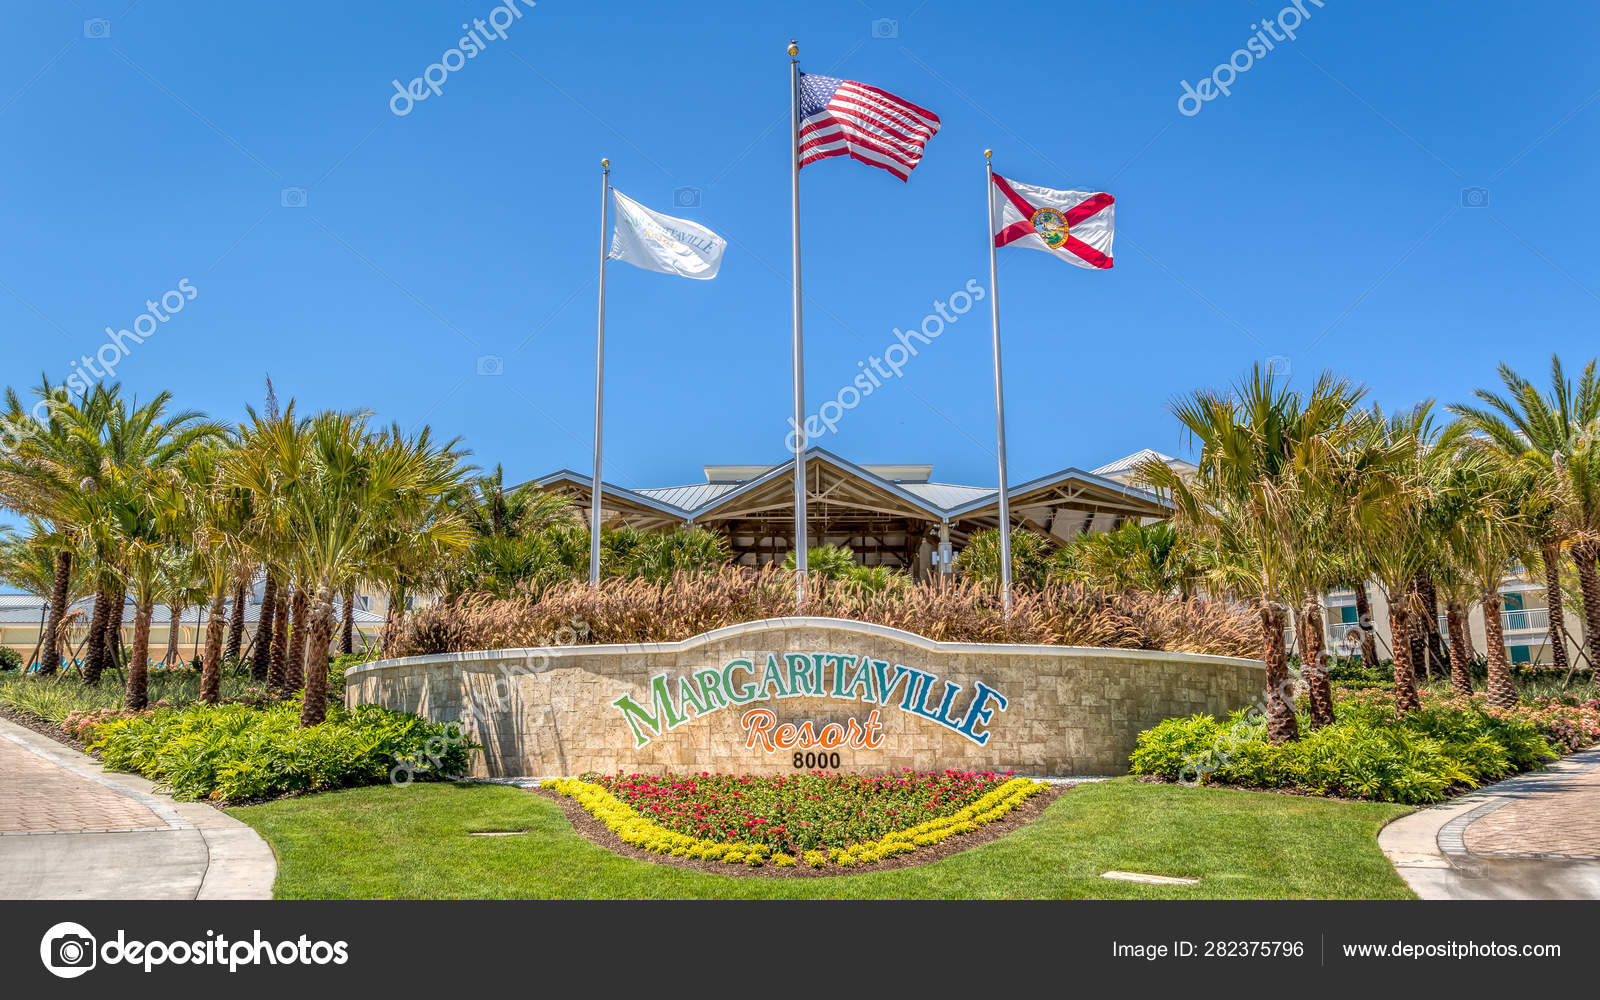 Margaritaville Resort Orlando  The main entrance of the